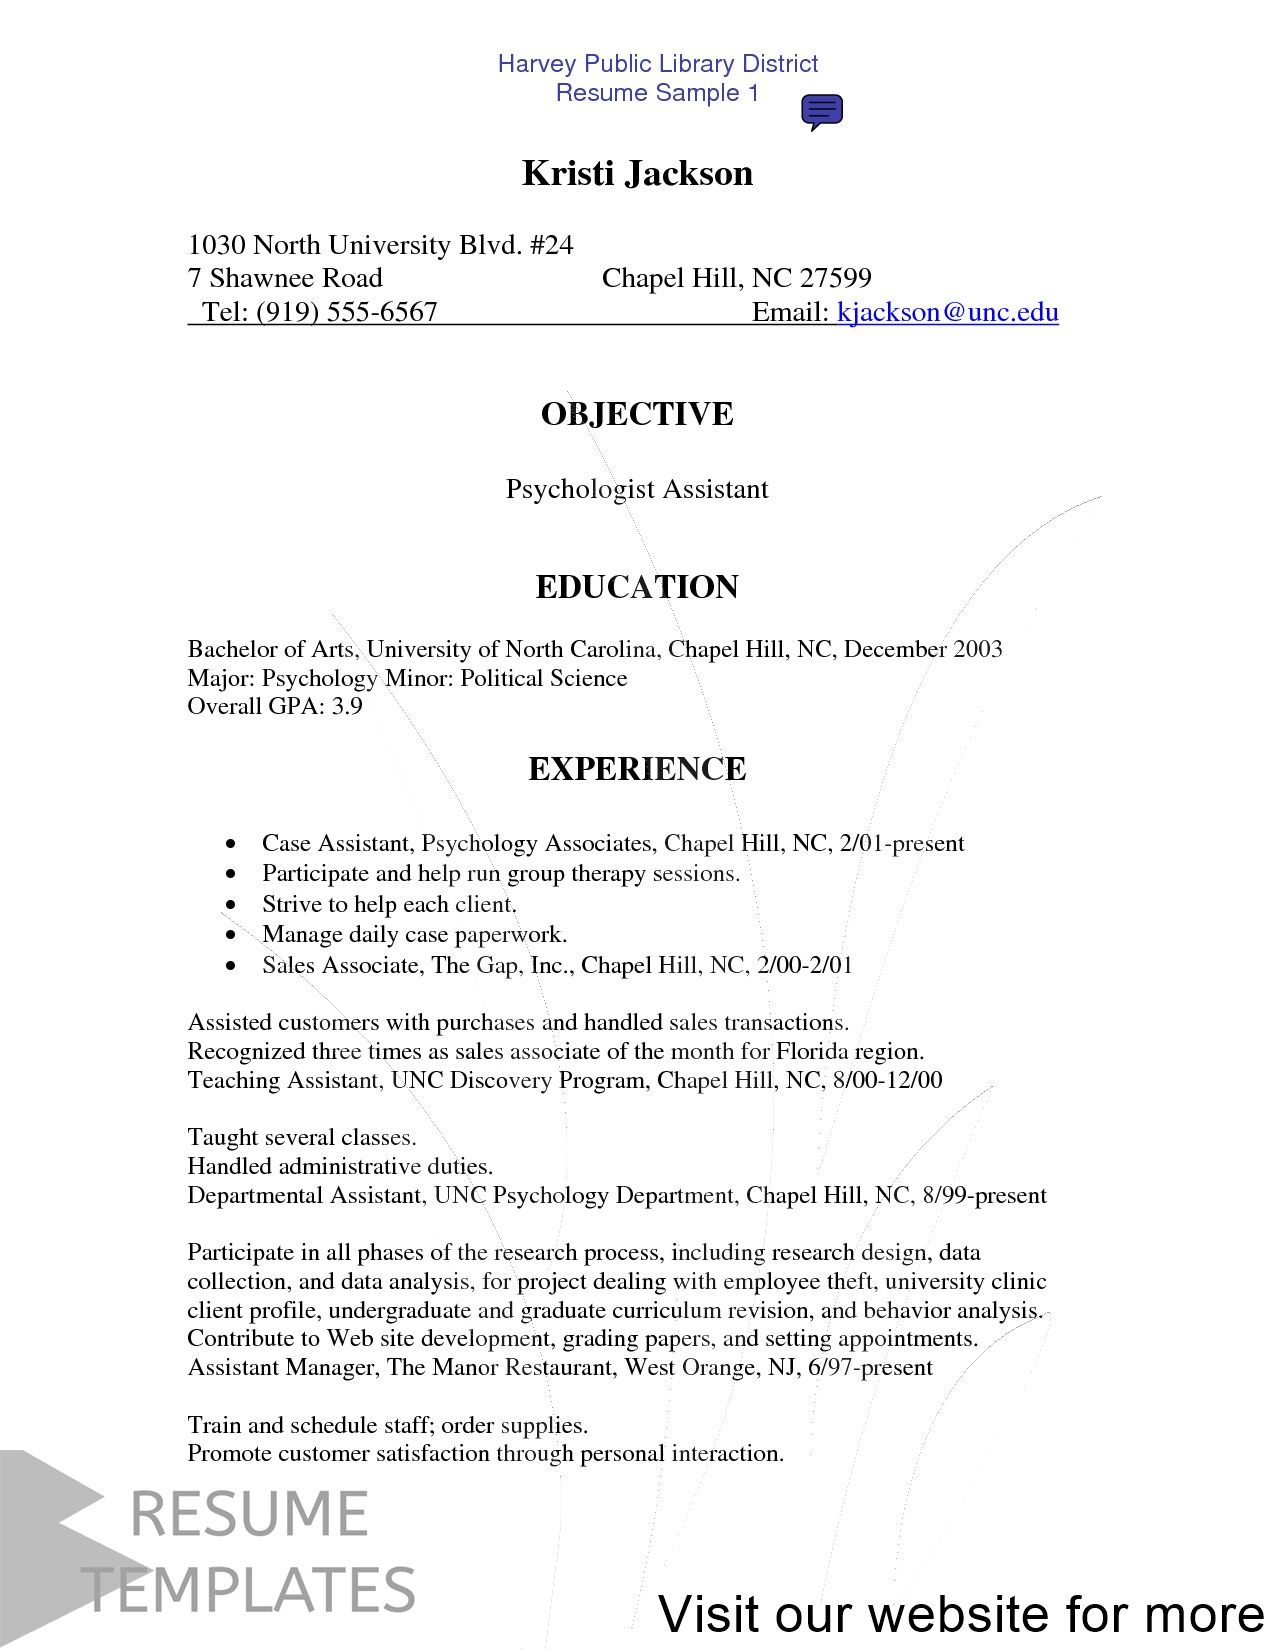 Resume Builder Api Professional In 2020 Resume Writing Tips